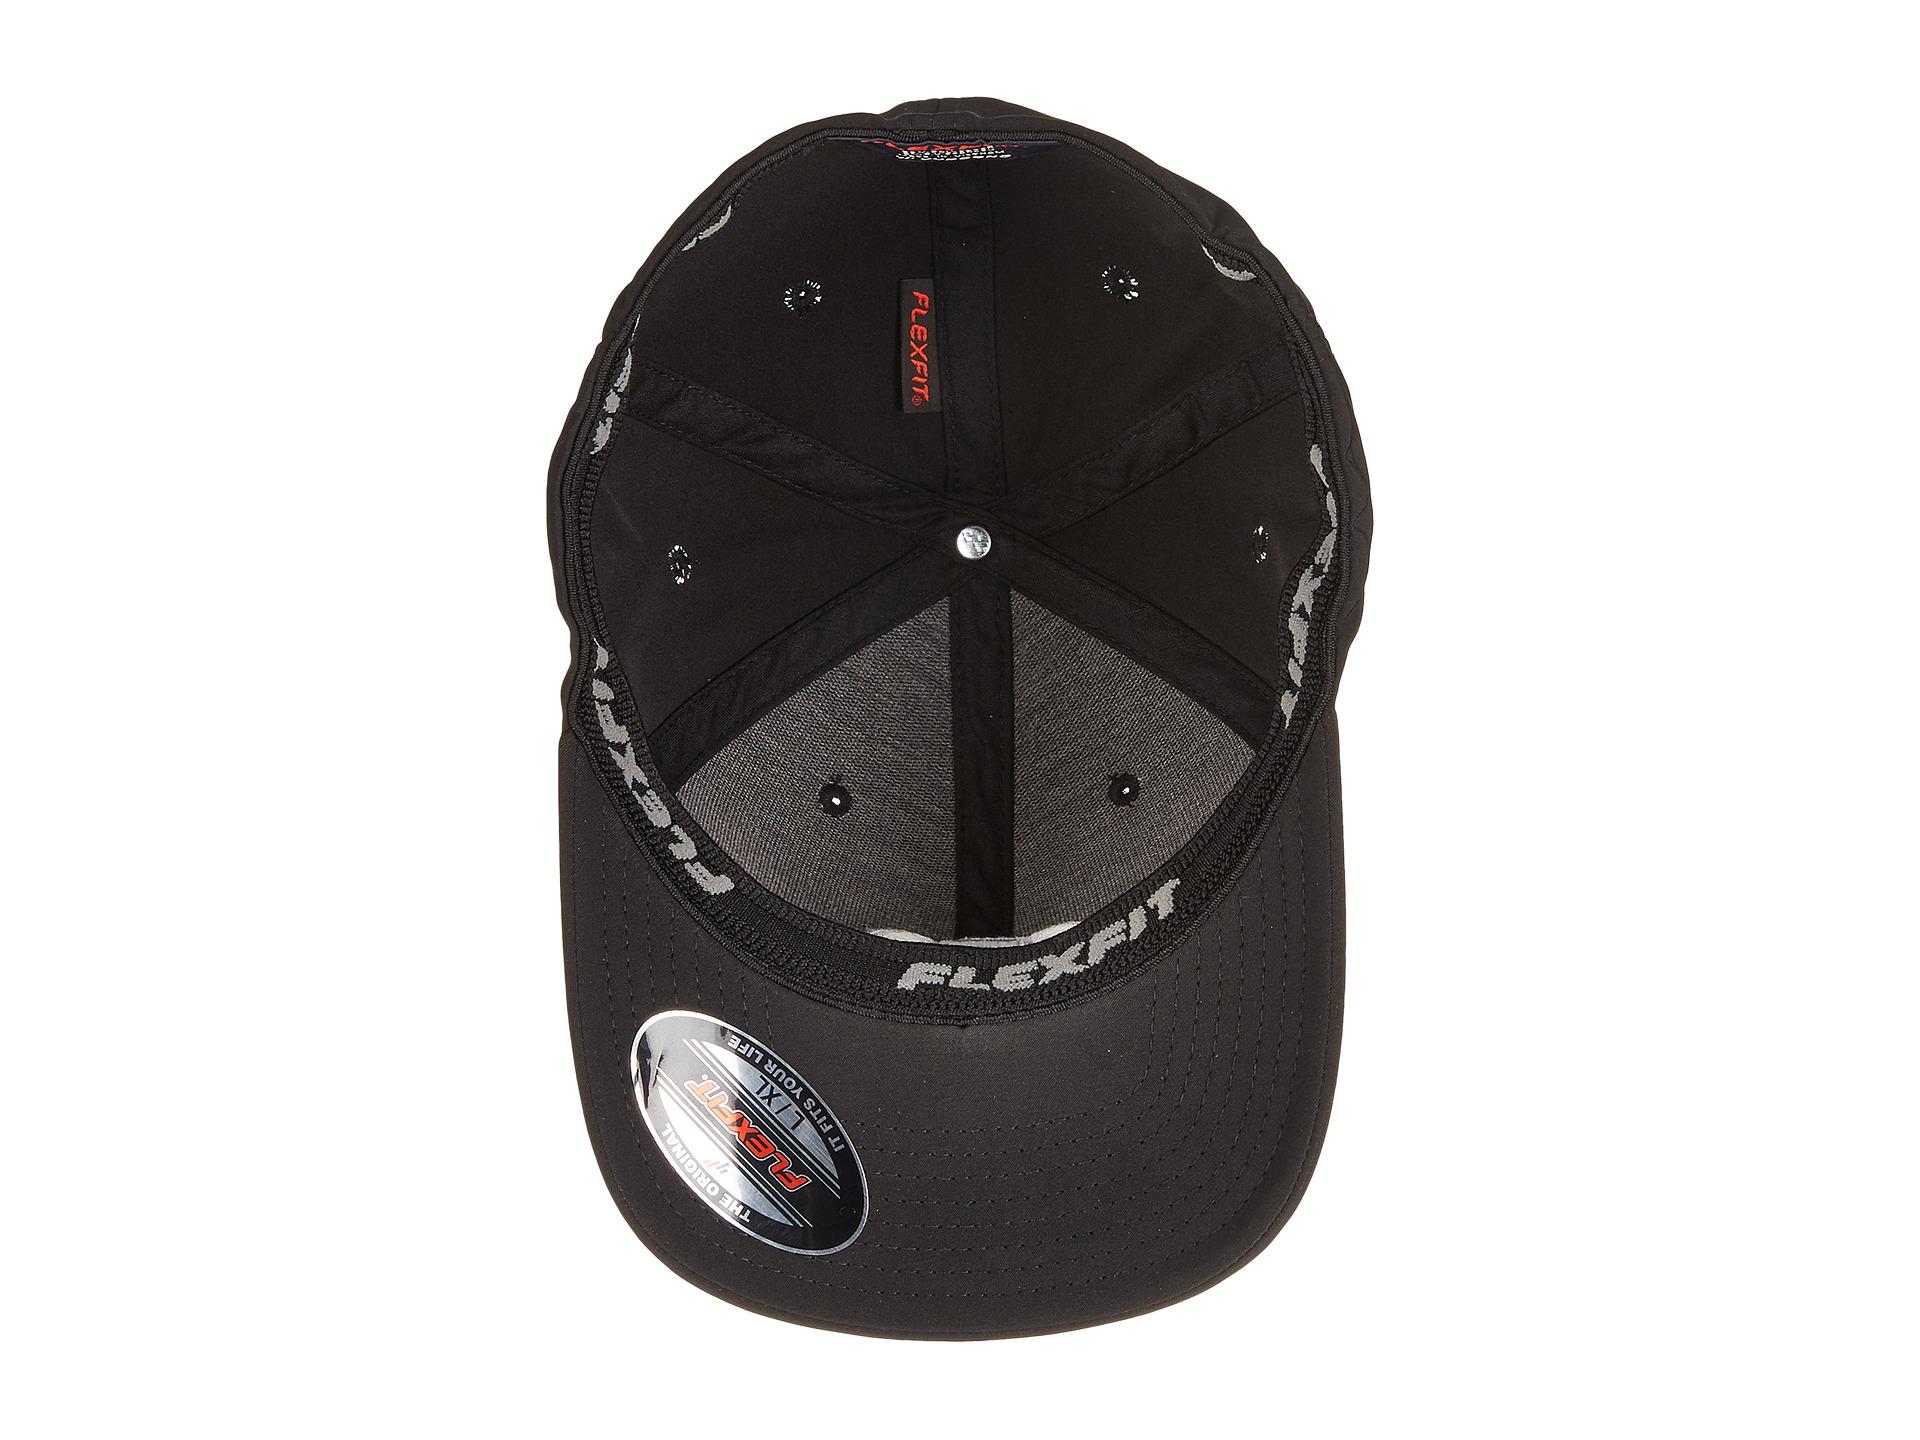 online store 76e8c dcfb4 ... sweden lyst travis mathew donnelly hat in black for men 1f19d 2917e